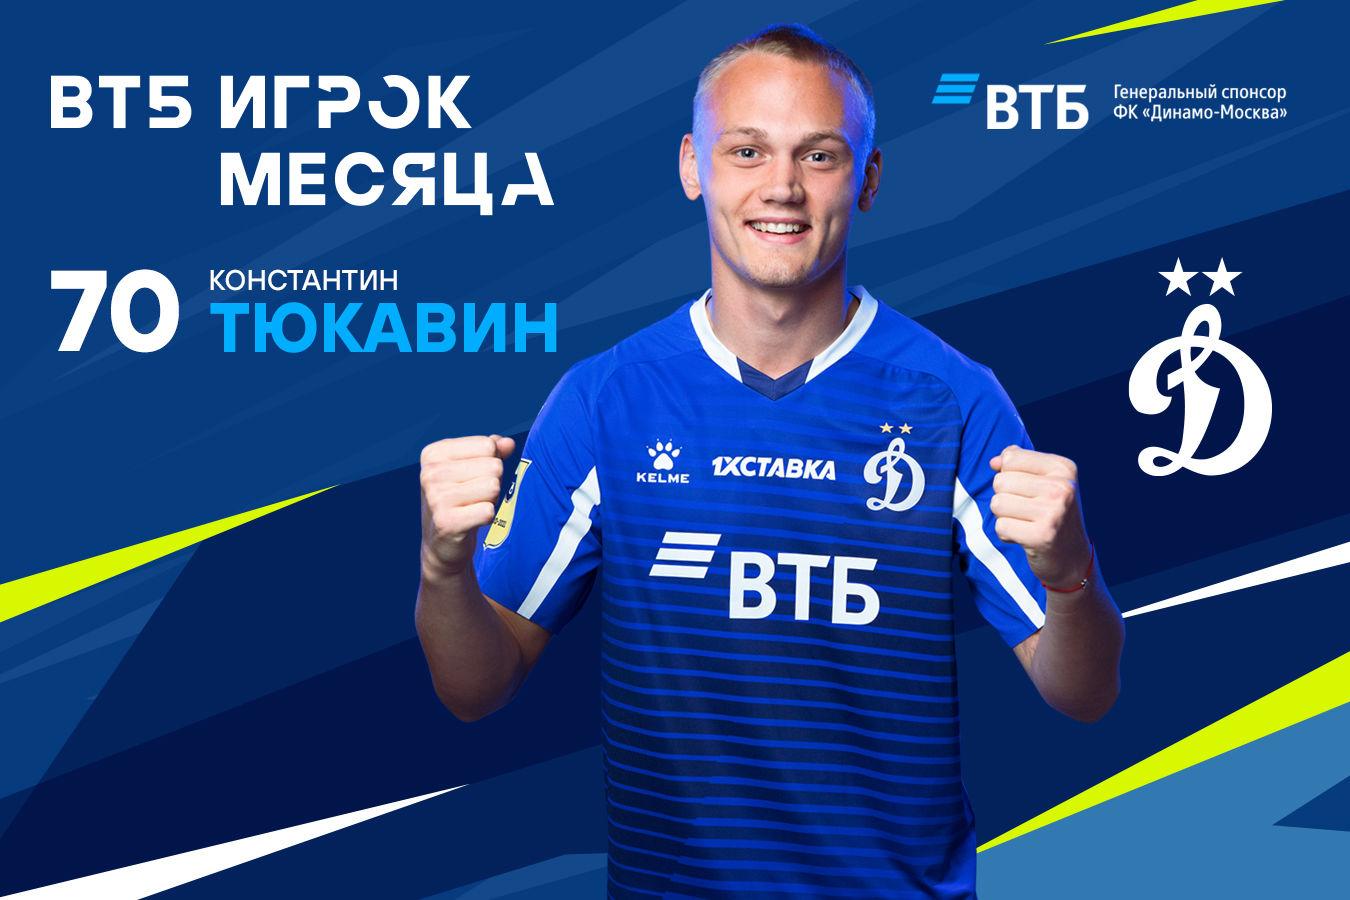 Константин Тюкавин — ВТБ игрок месяца в апреле